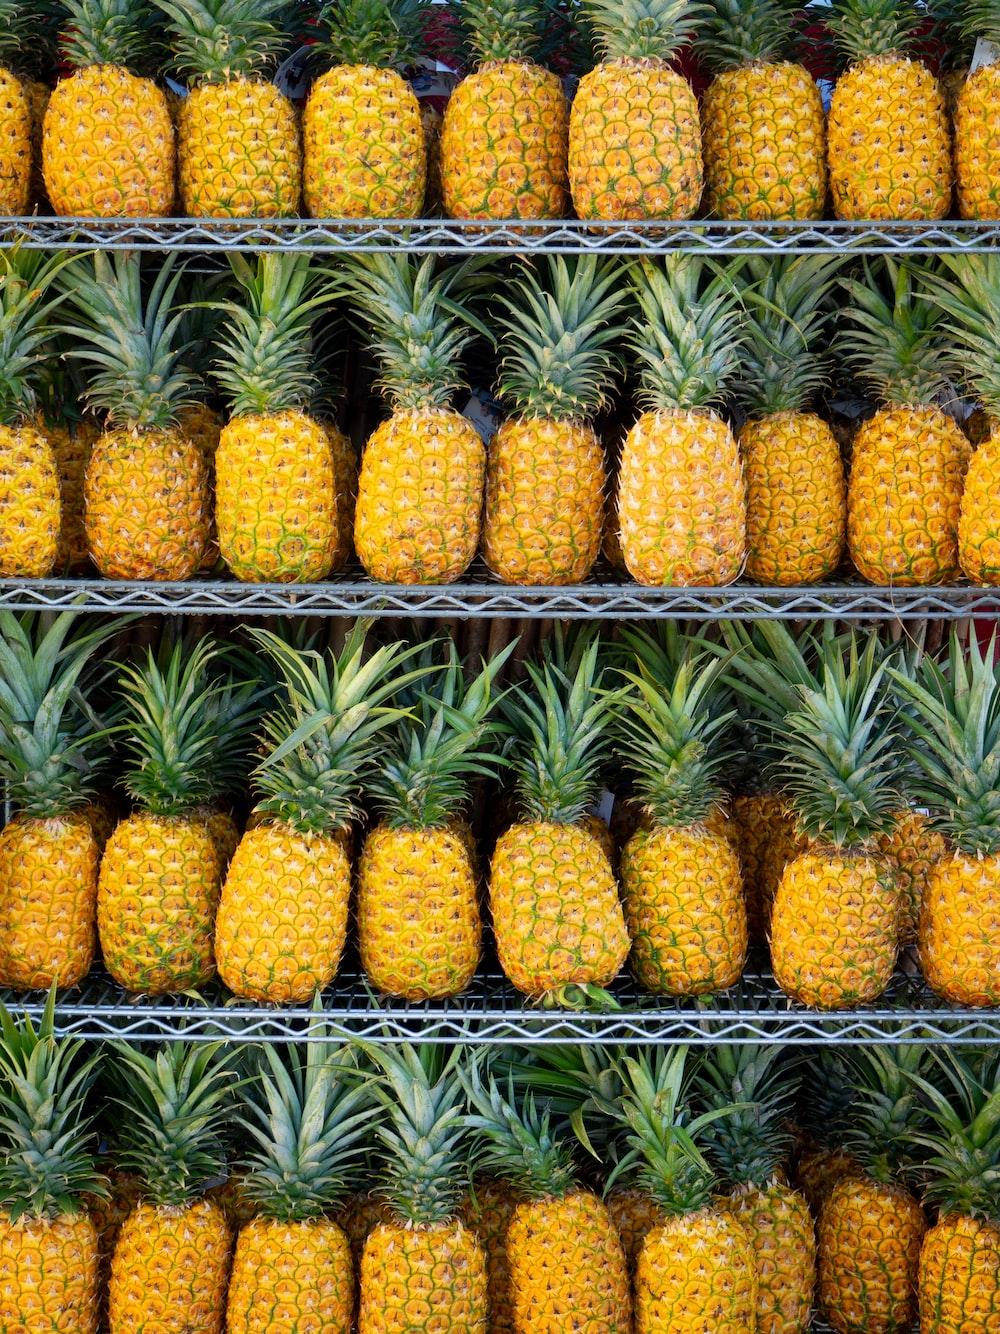 ripe pineapple fruits on shelf